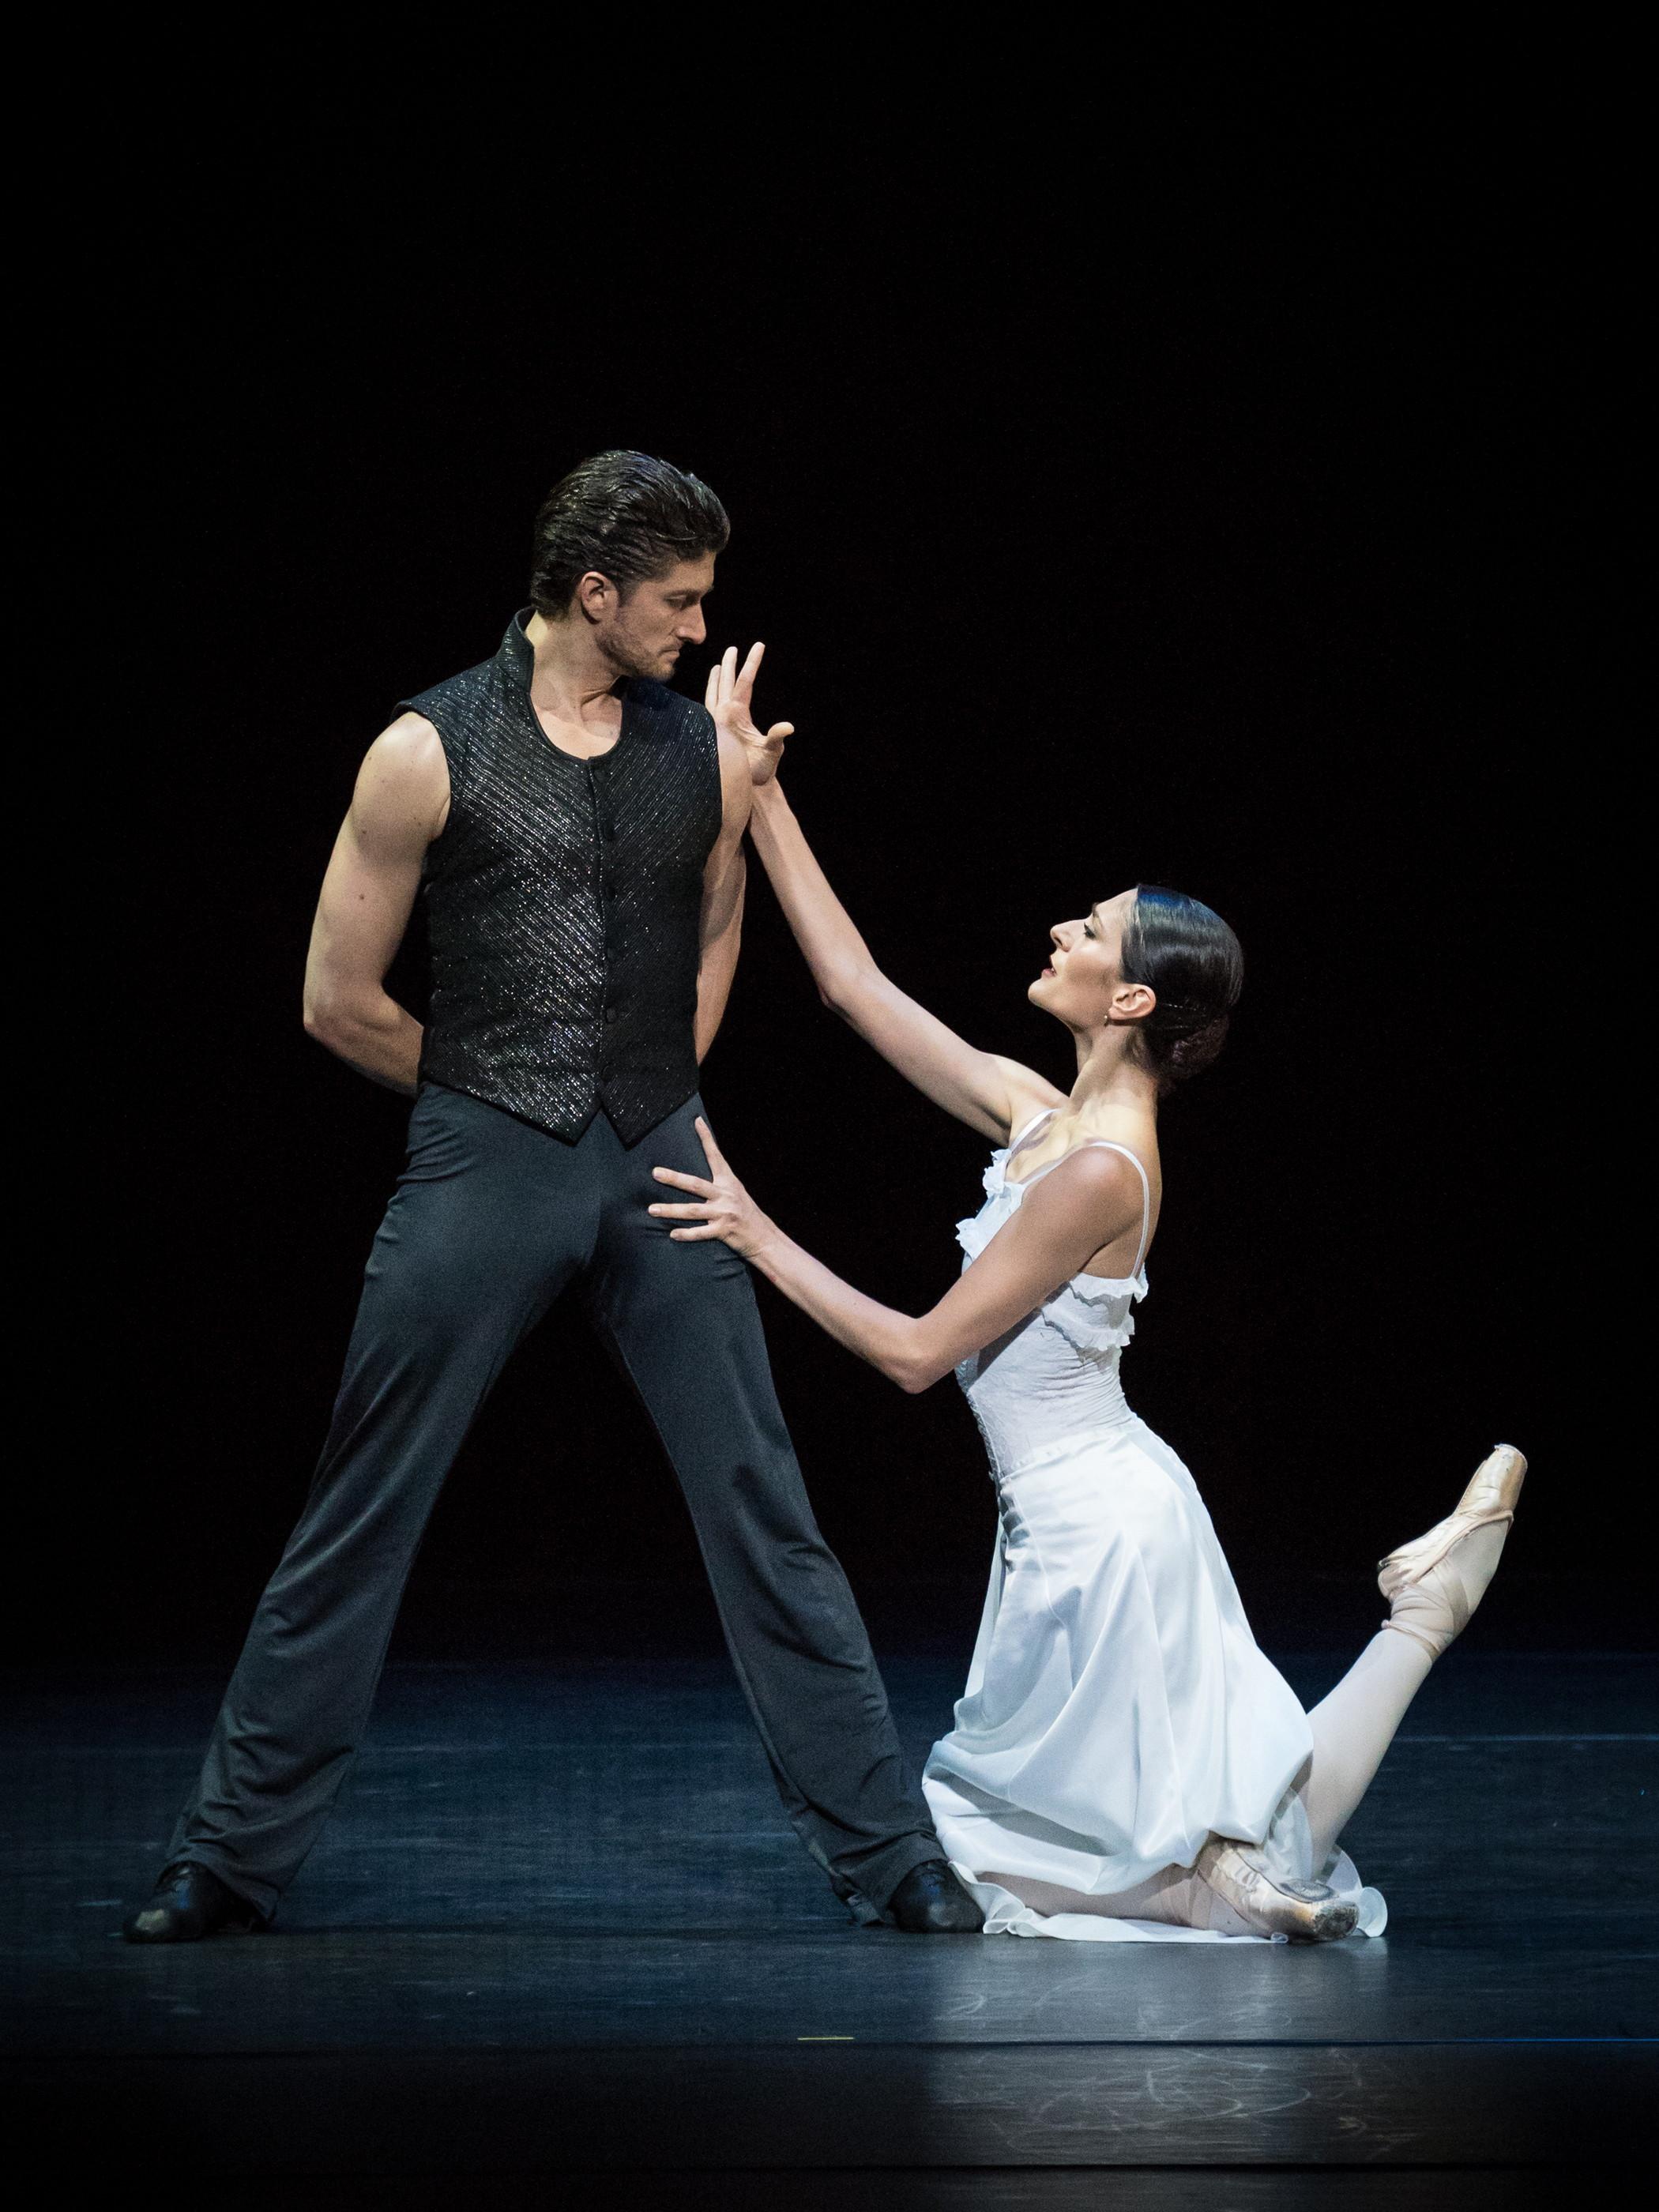 Ketevan Papava and Eno Peçi. Copyright: Vienna State Ballet/Ashley Taylor